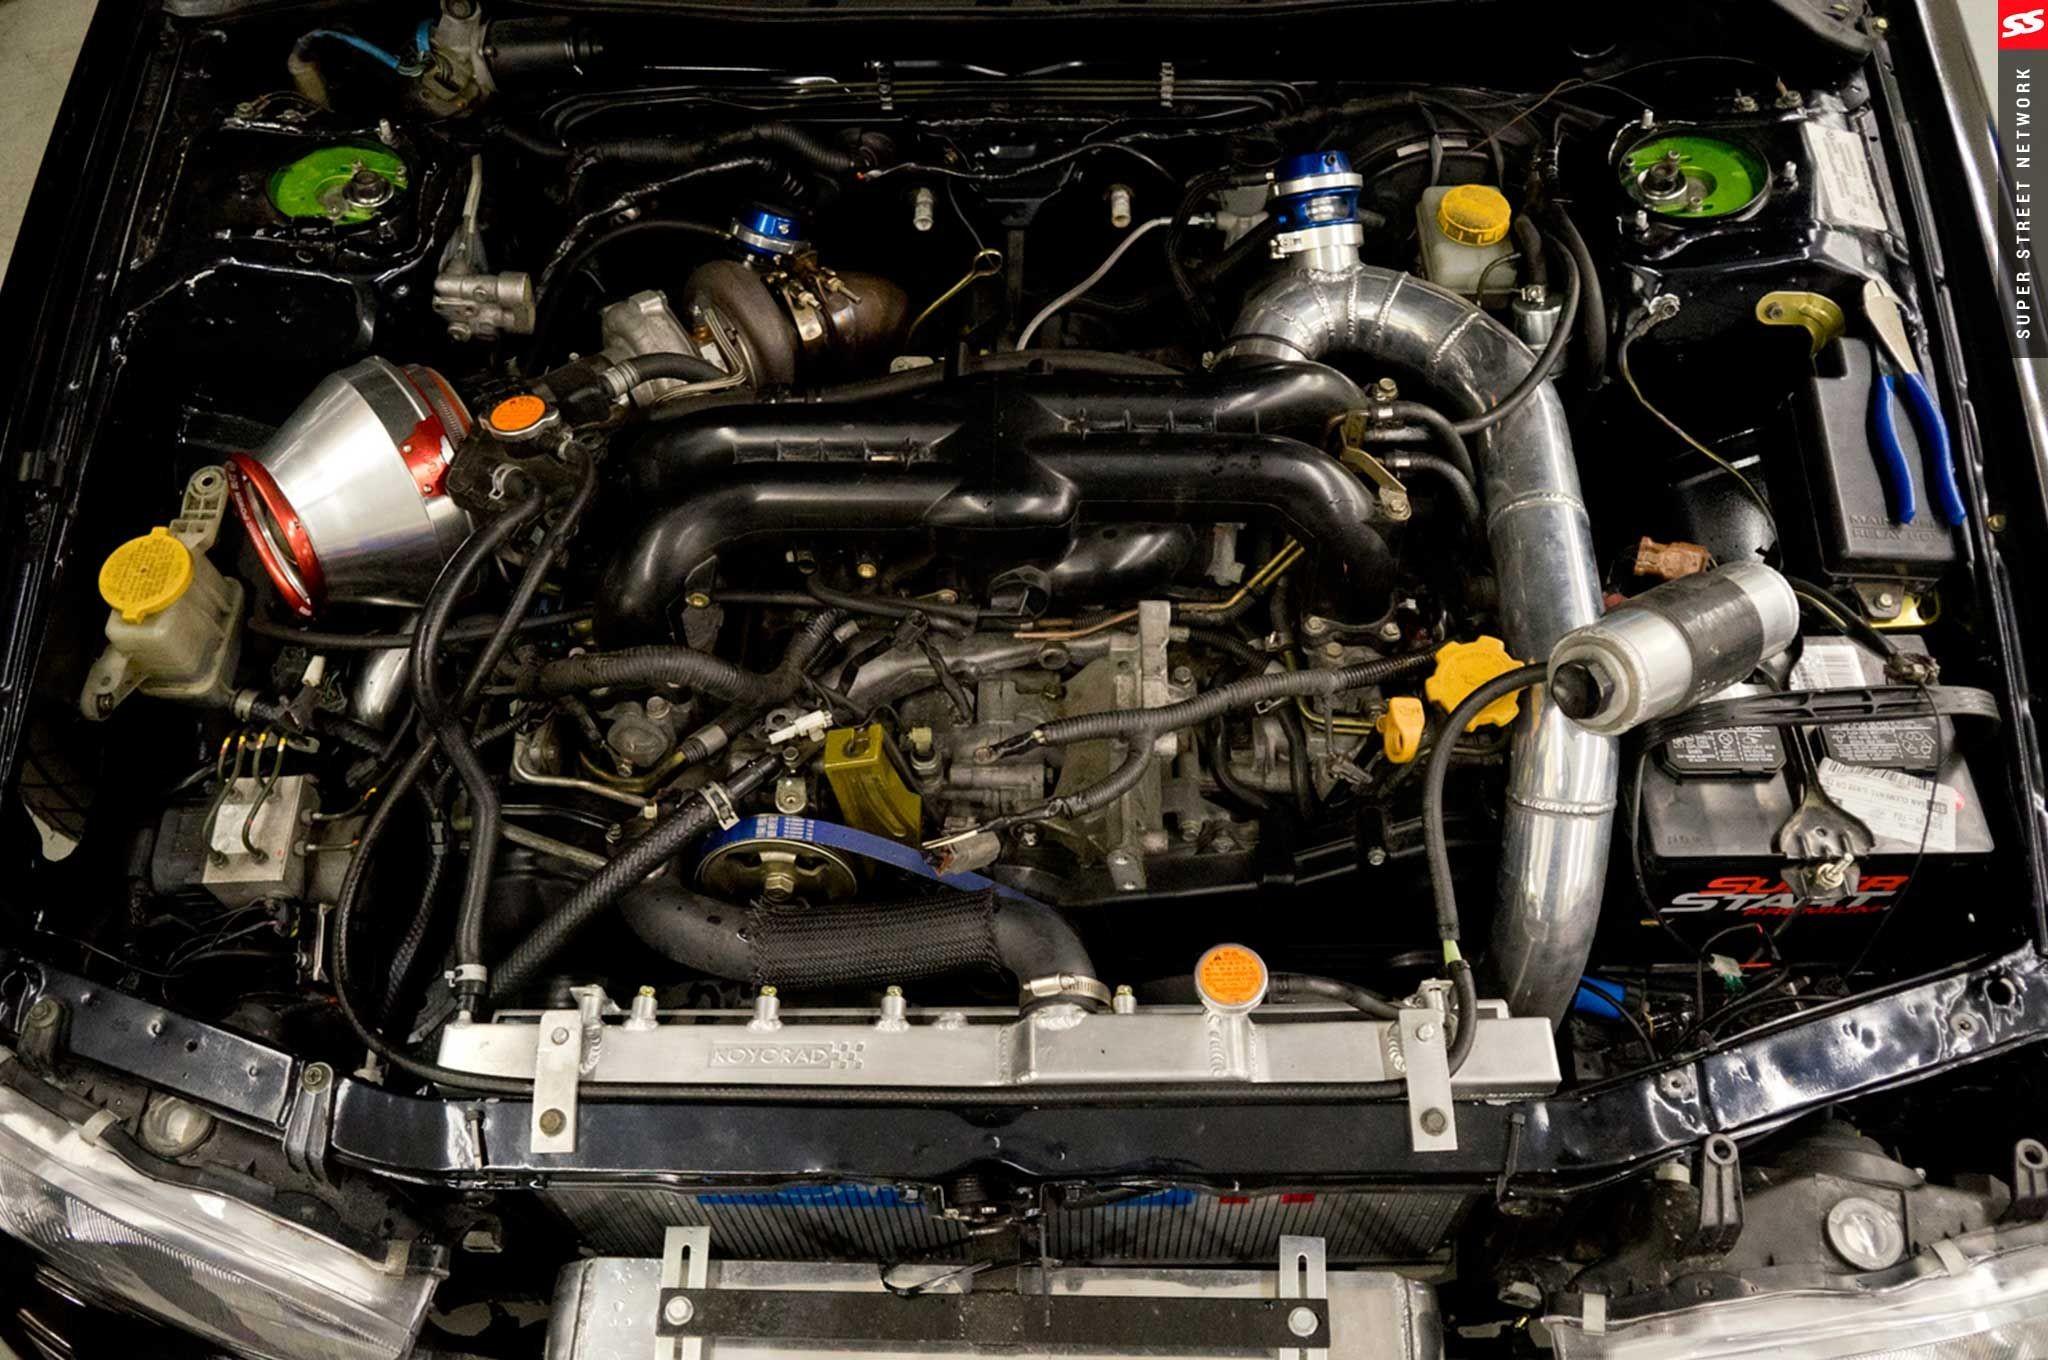 Wrx Engine Bay Diagram 2000 Subaru Impreza 2 5rs Modified Magazine Legacy Surrealmirage Swap Electrical Of Related Post